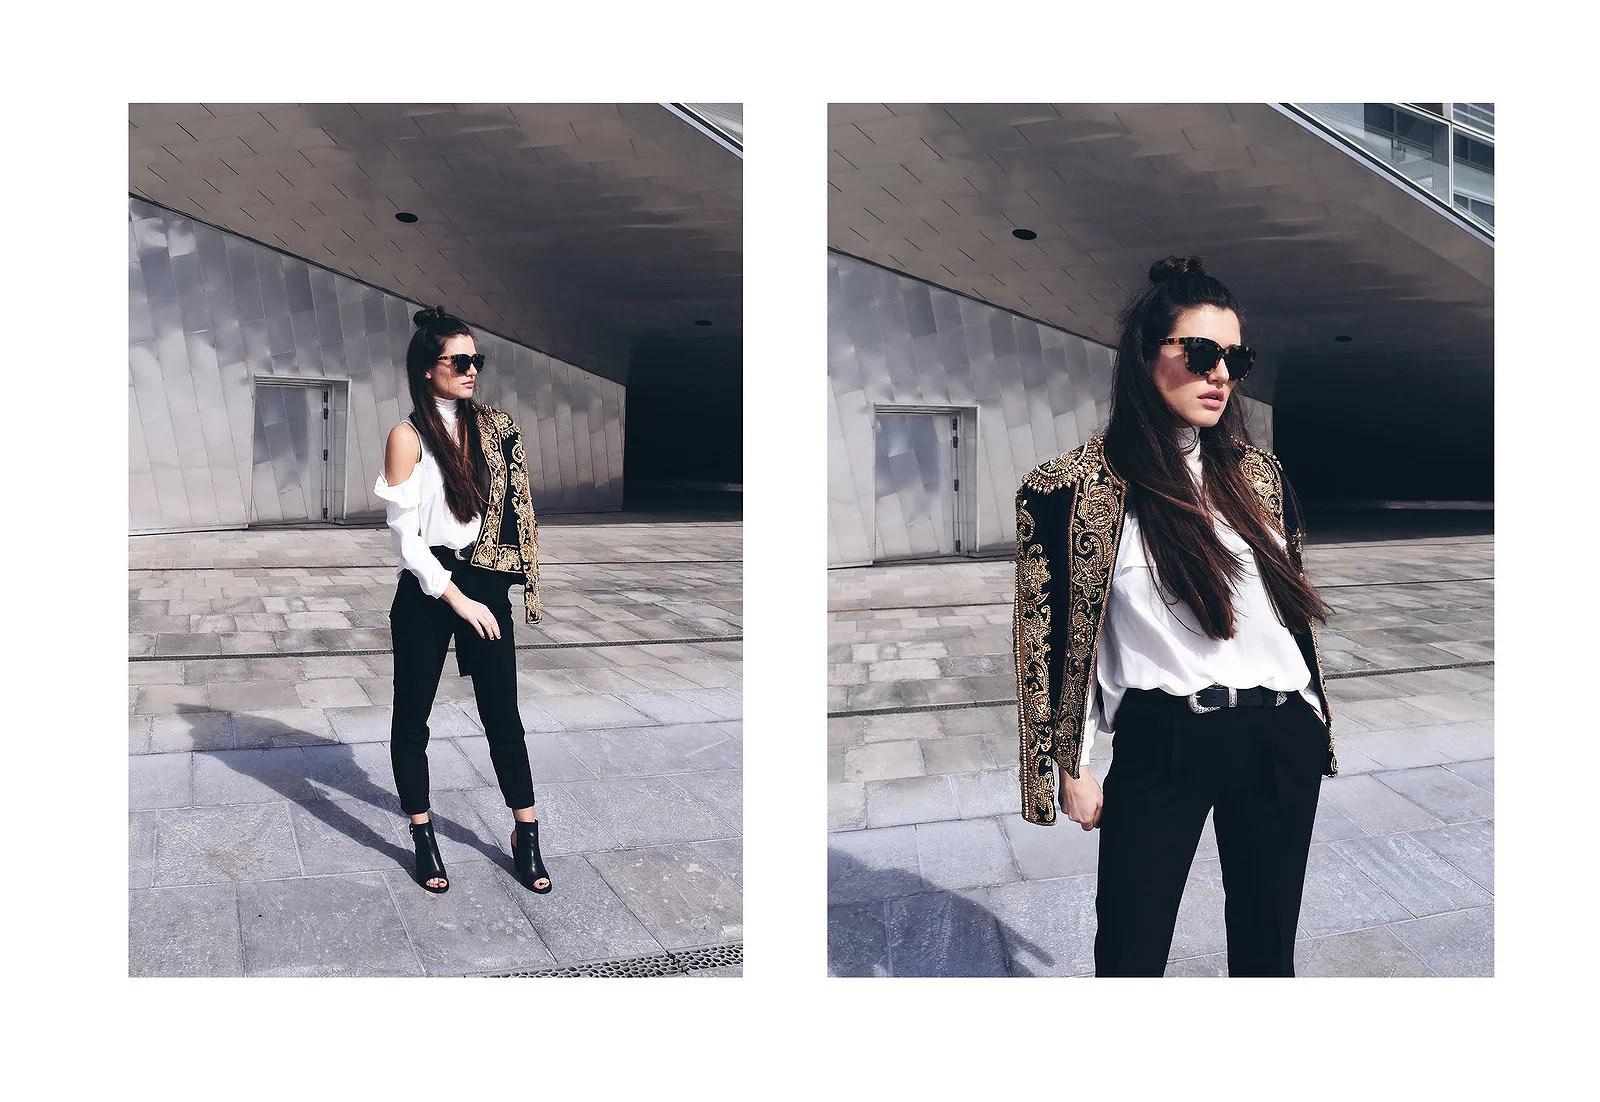 balmain inspired jacket 5